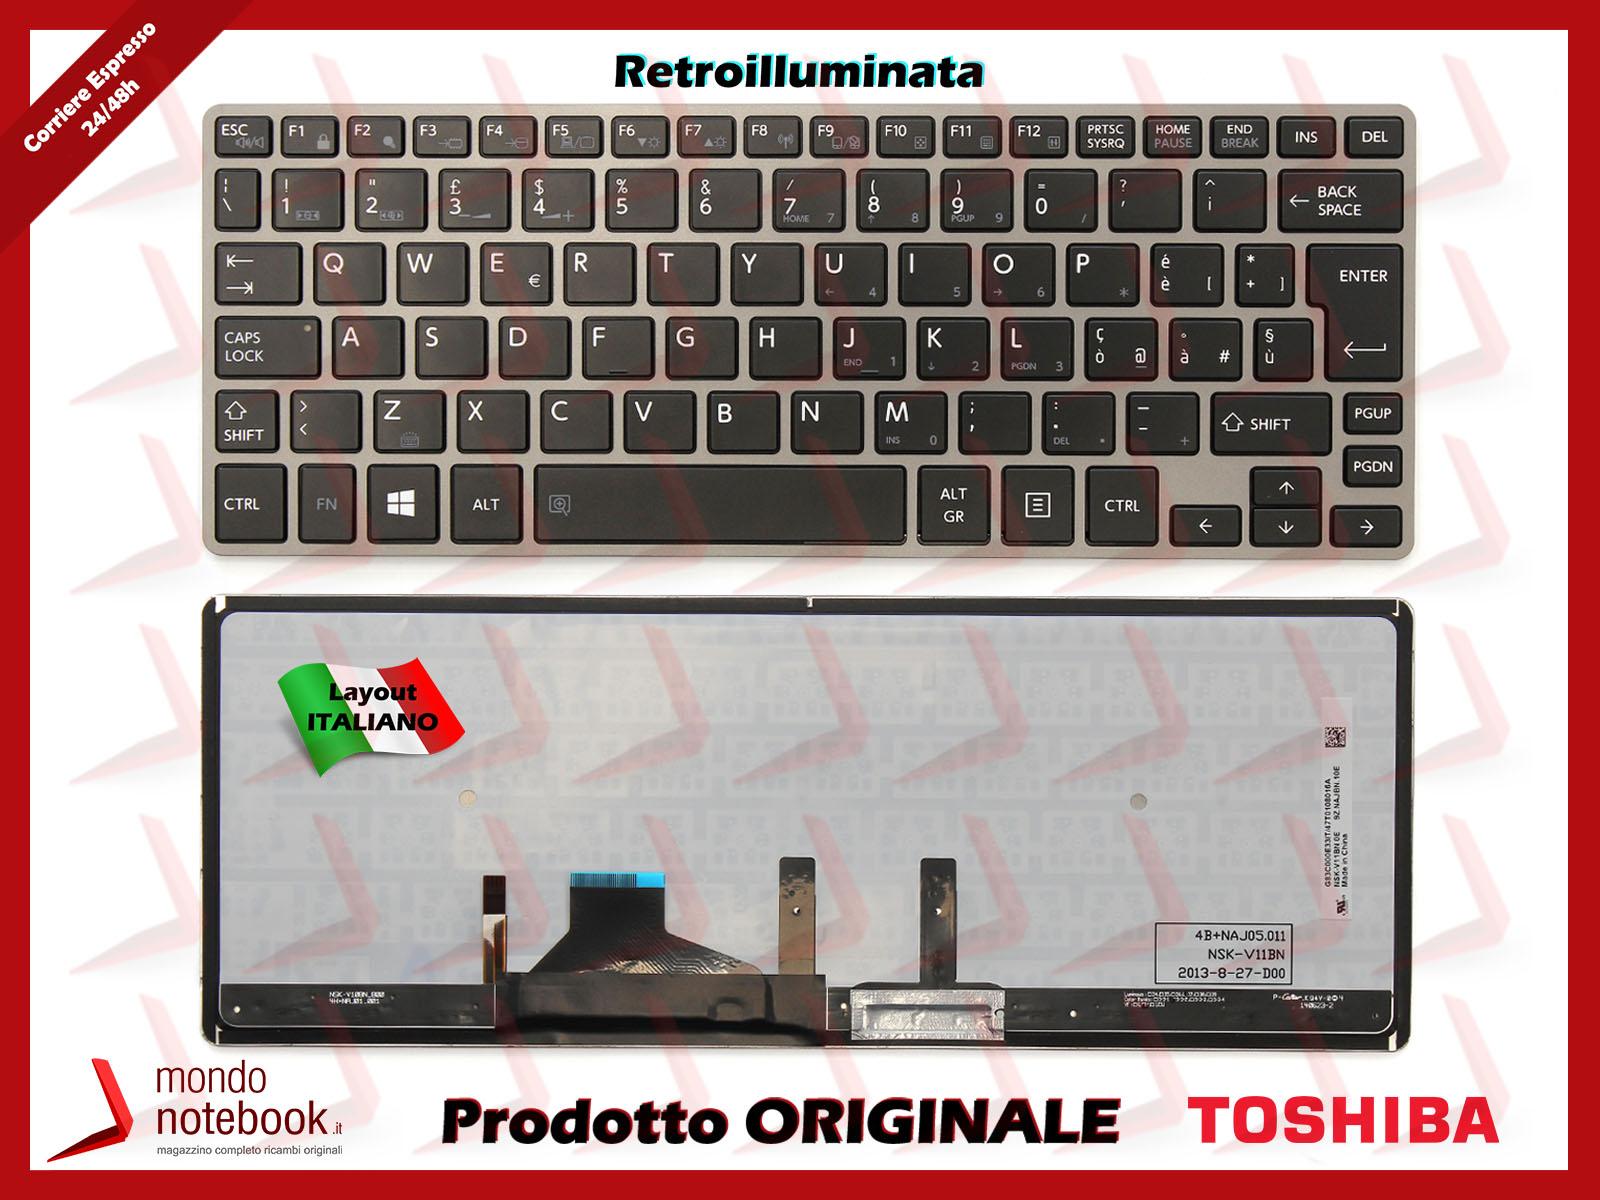 https://www.mondonotebook.it/2348/tastiera-notebook-toshiba-portege-z30-b-senza-trackpoint-rigenerata.jpg